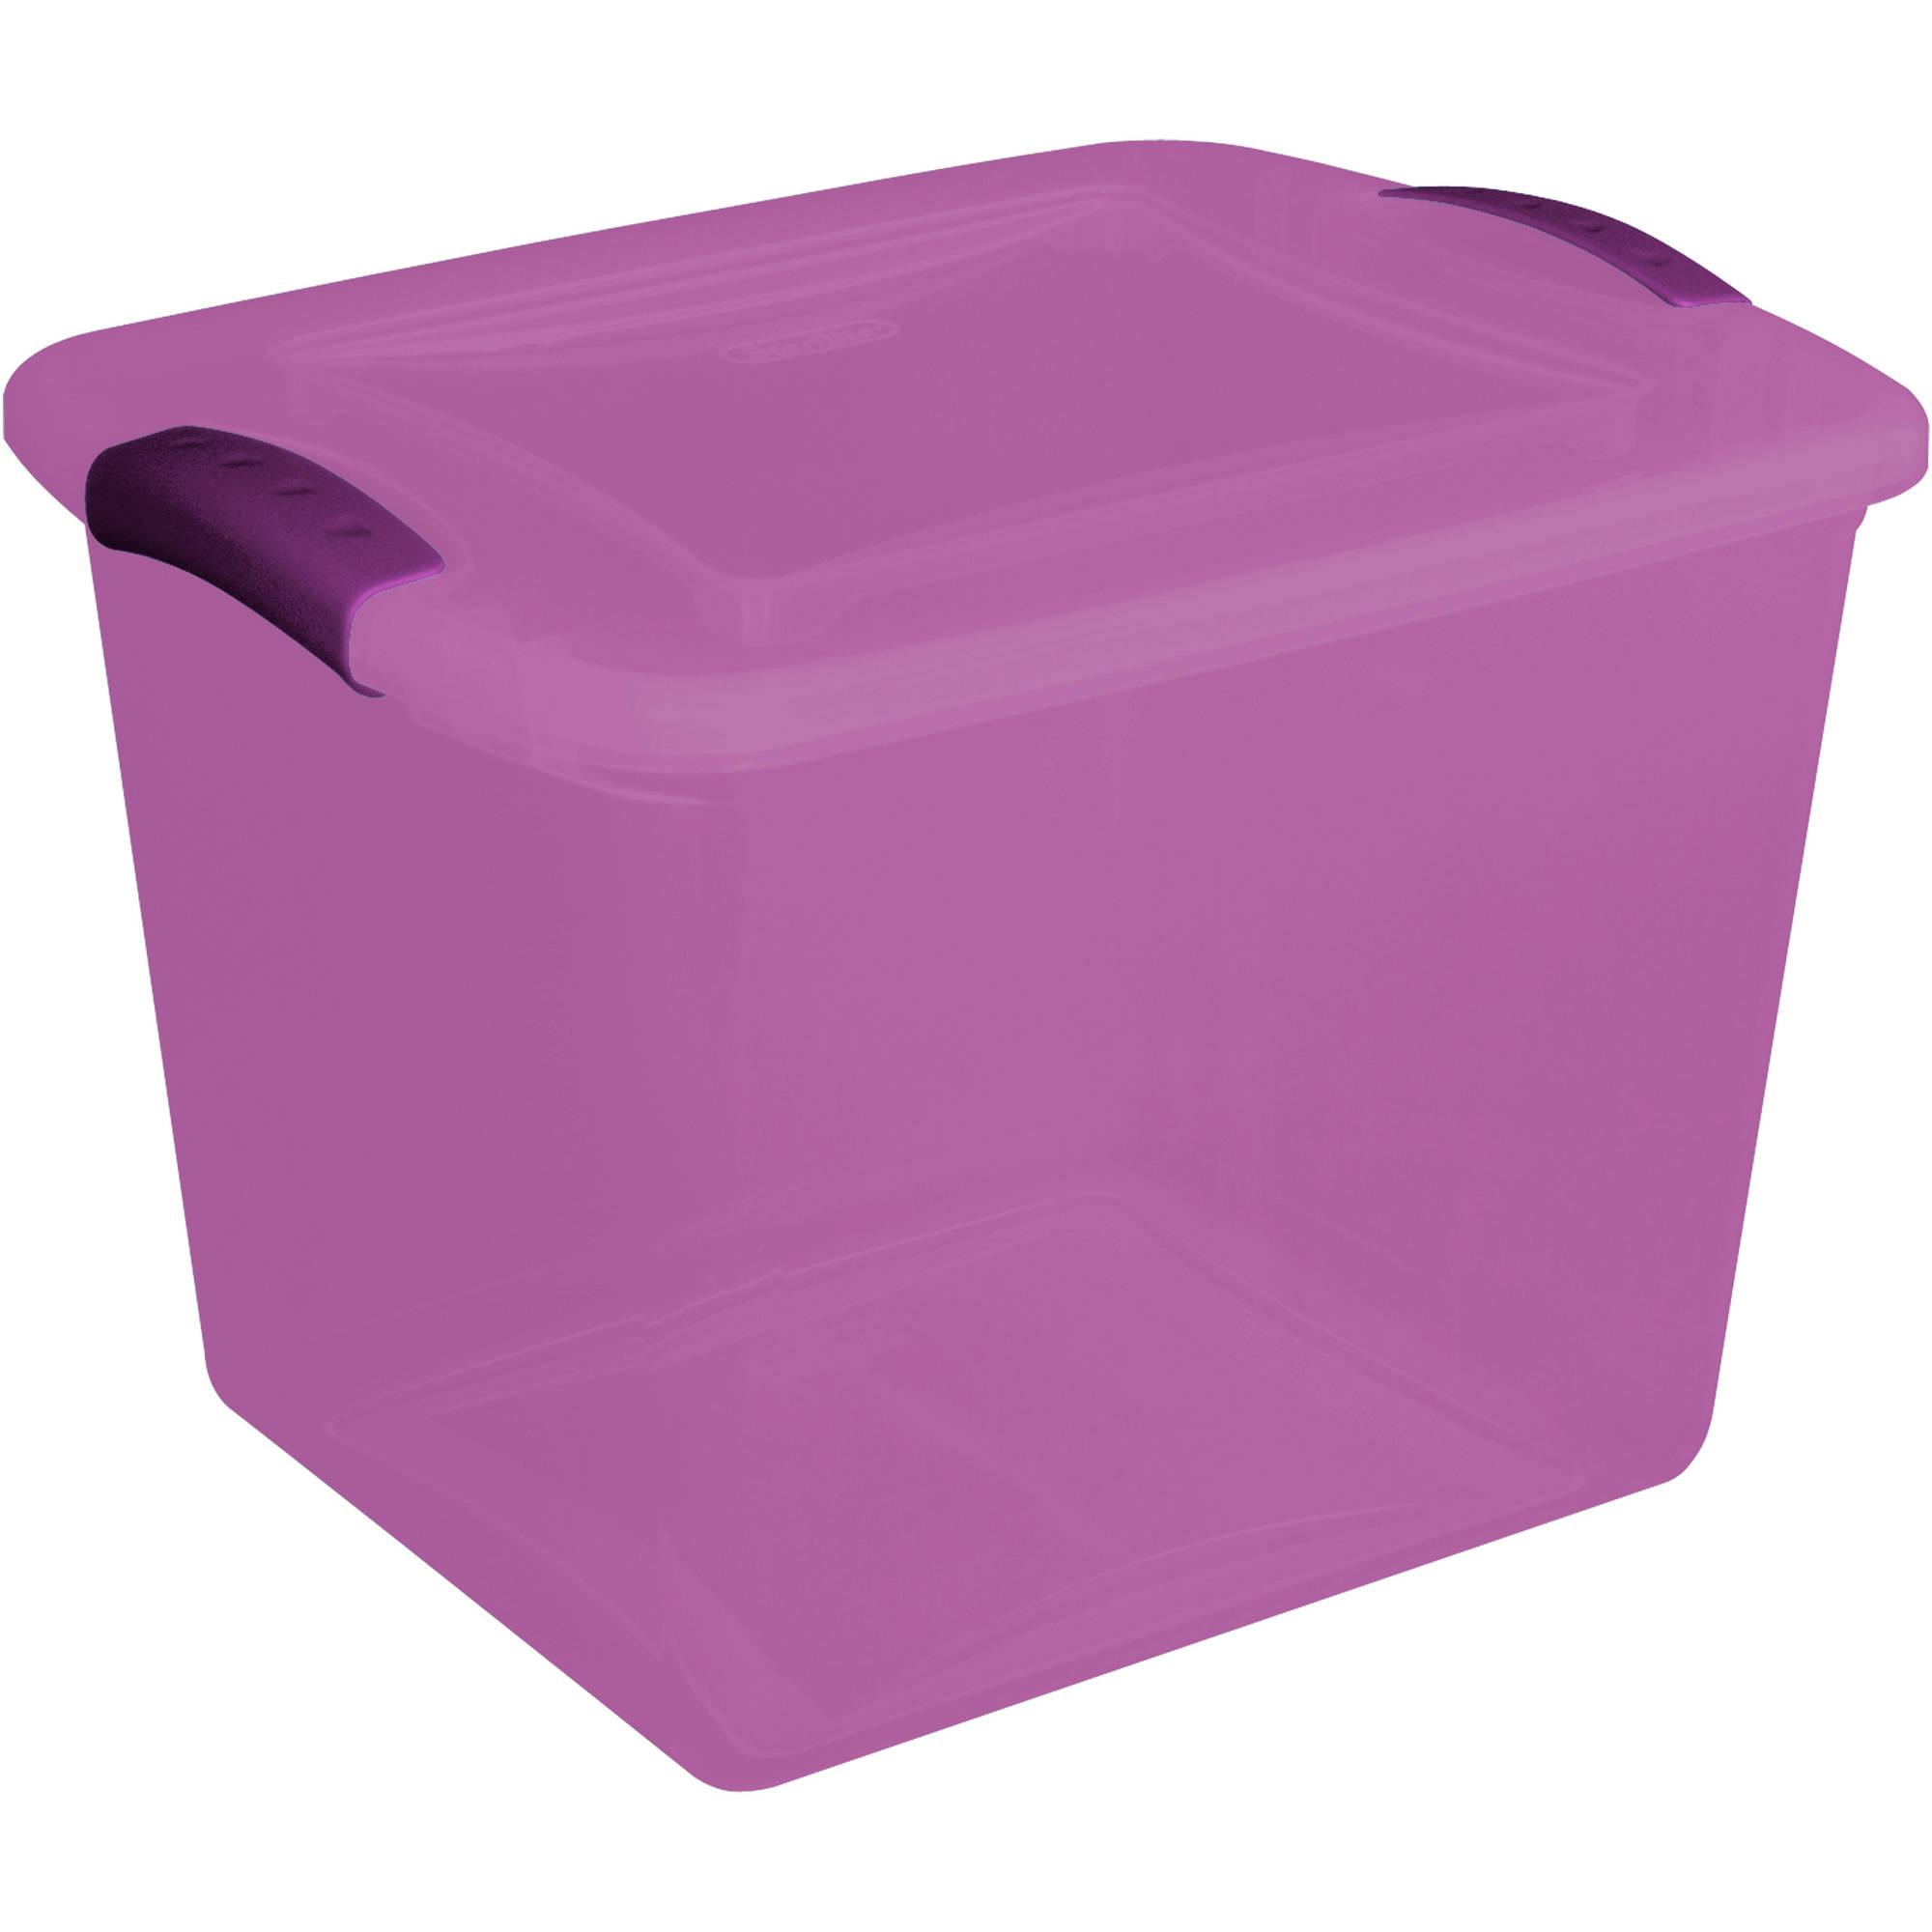 Sterilite 6.75-Gallon (27-Quart) Latch Storage Box, Purple, Set of 10